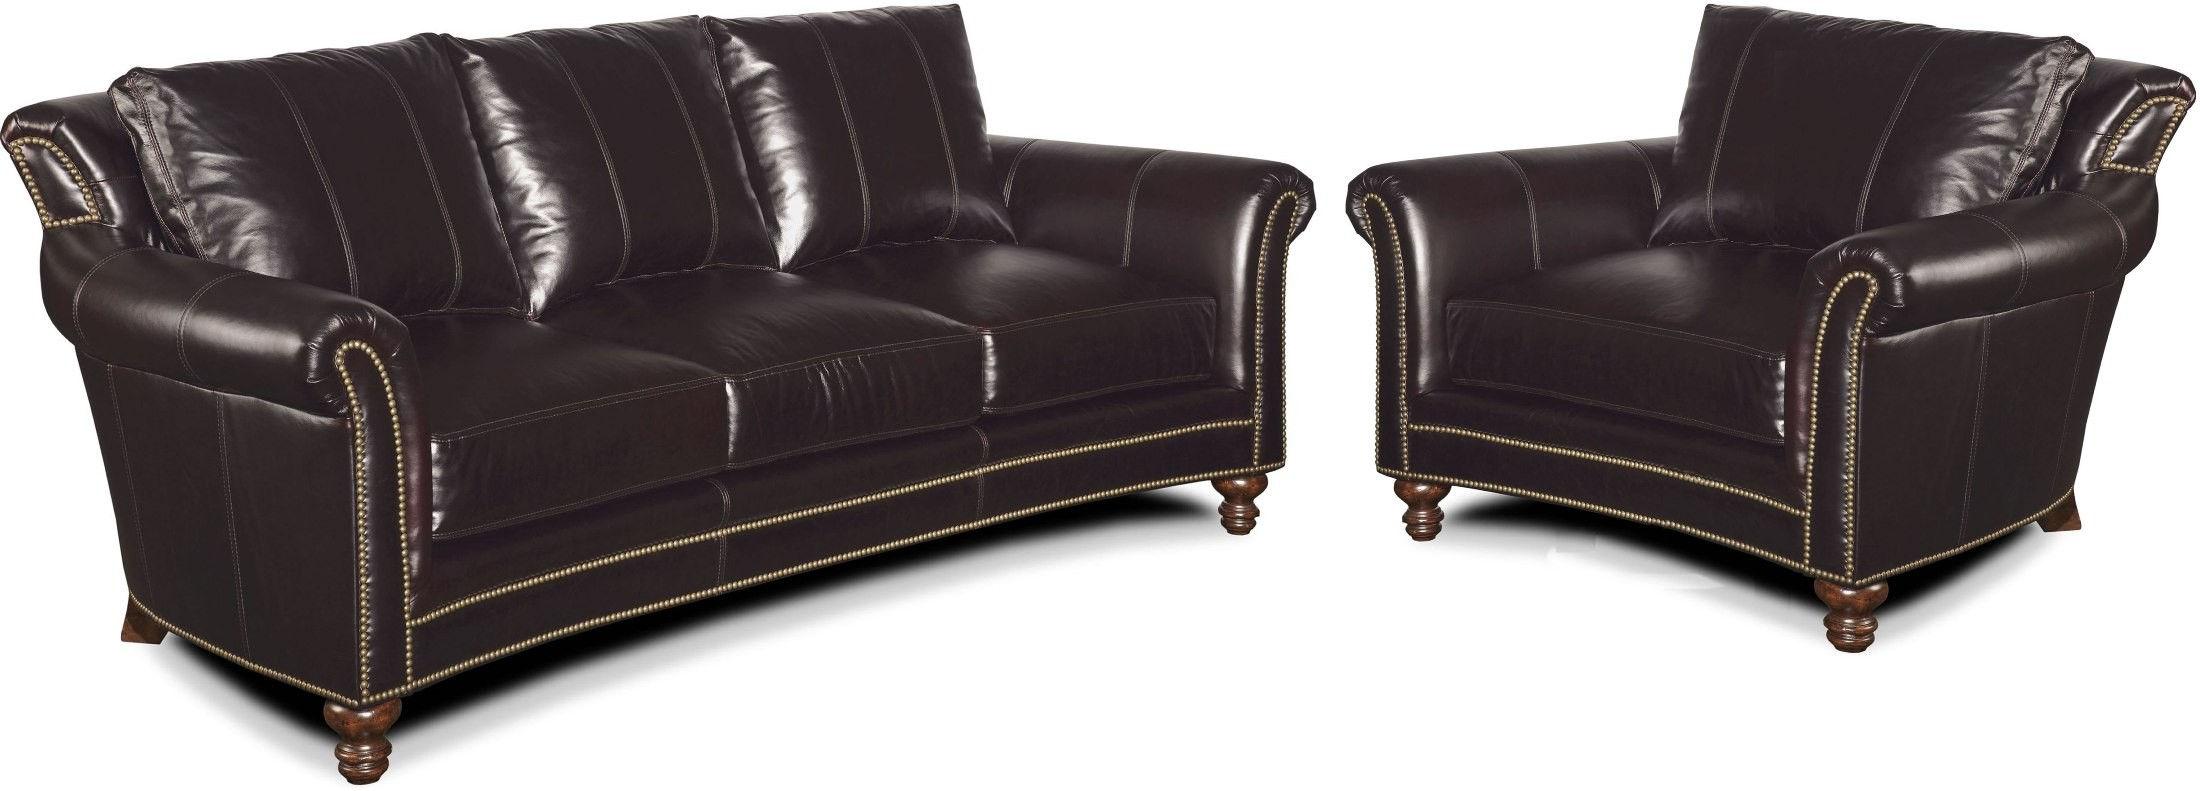 bradington young logo richardson mahogany stationary living room set by bradington young logo x logo79 young